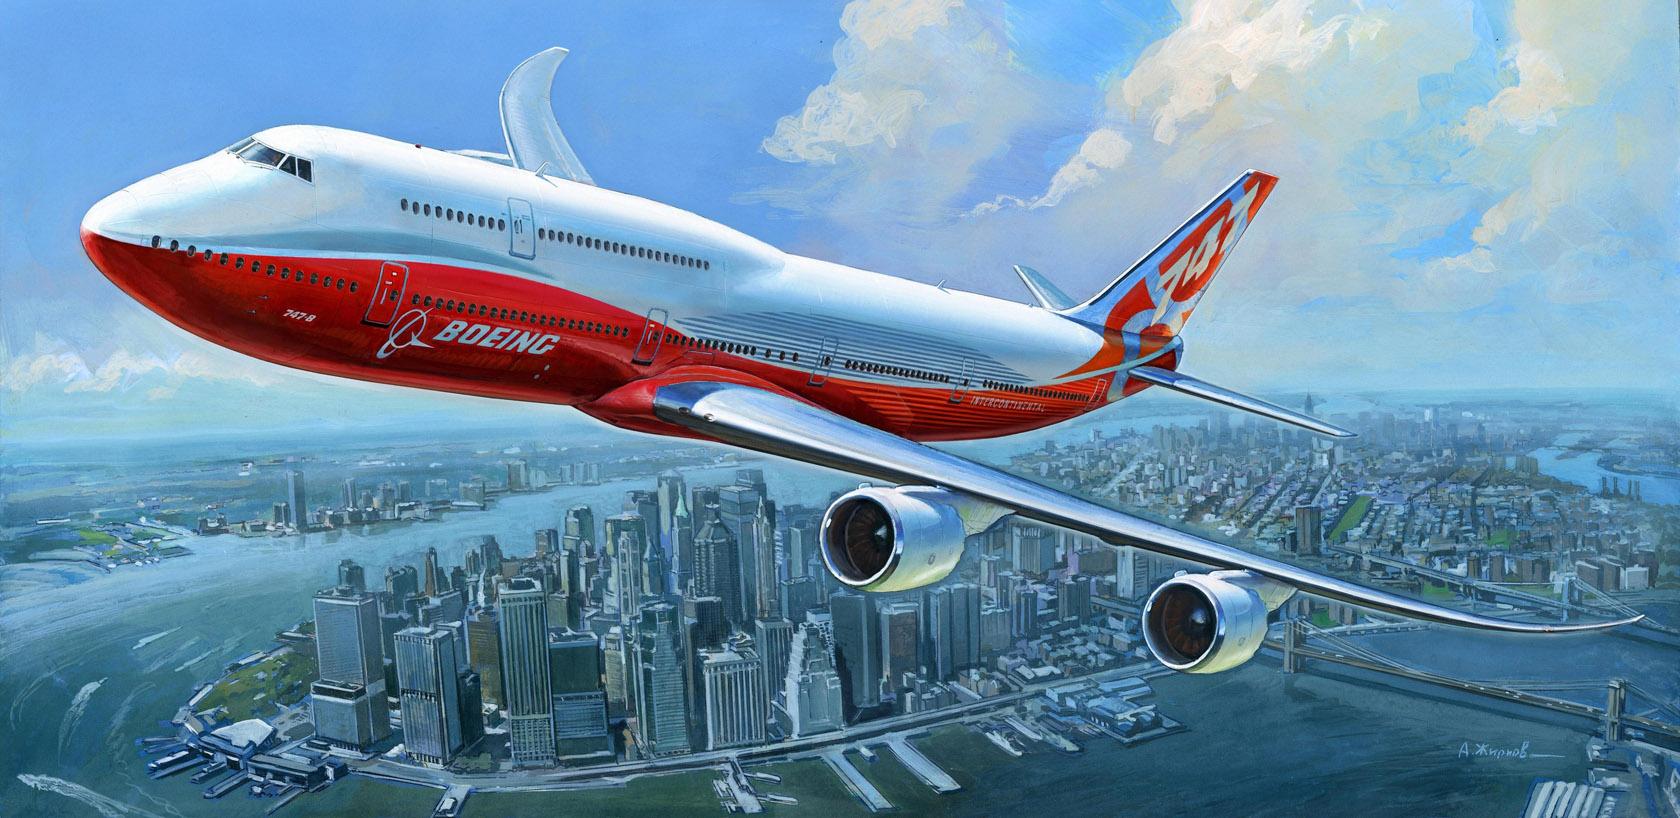 рисунок Пассажирский авиалайнер Боинг 747-8